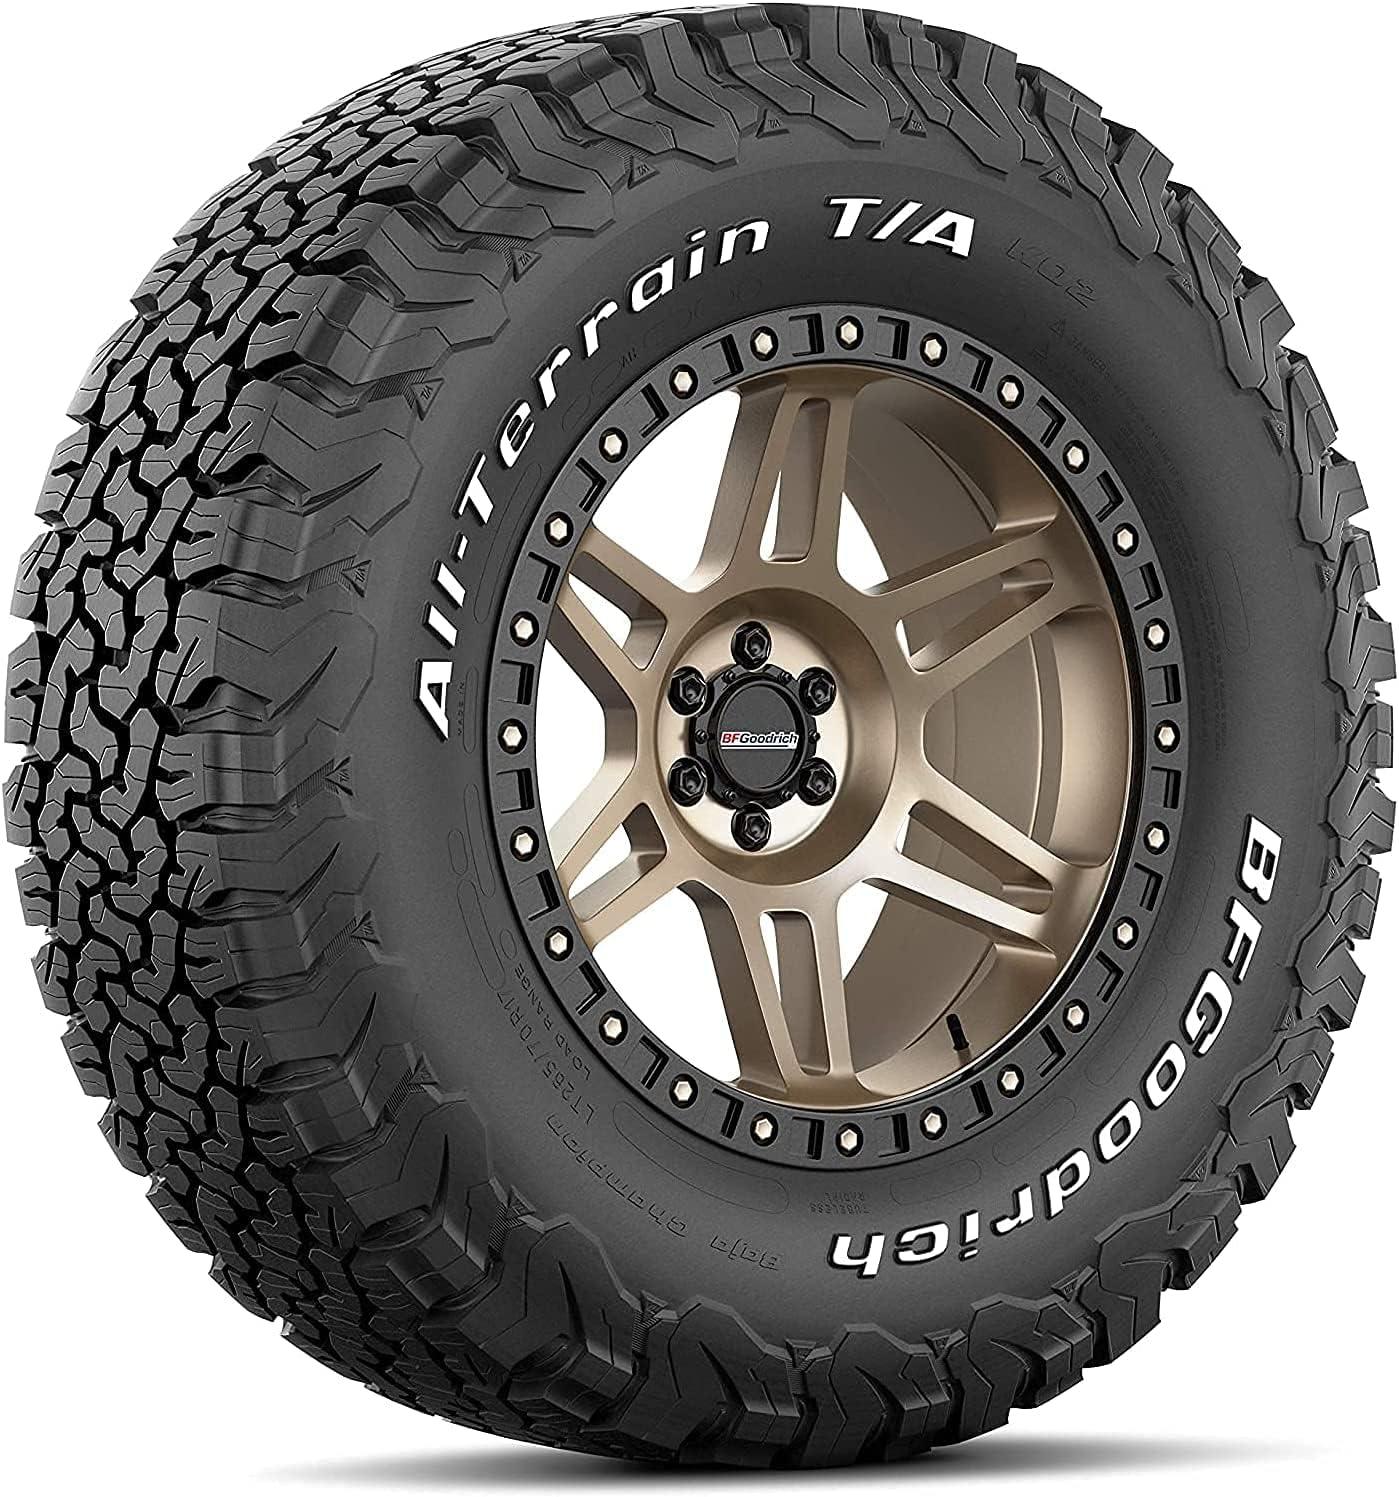 BFGoodrich All Terrain T/A KO2 Radial Car Tire for Light Trucks